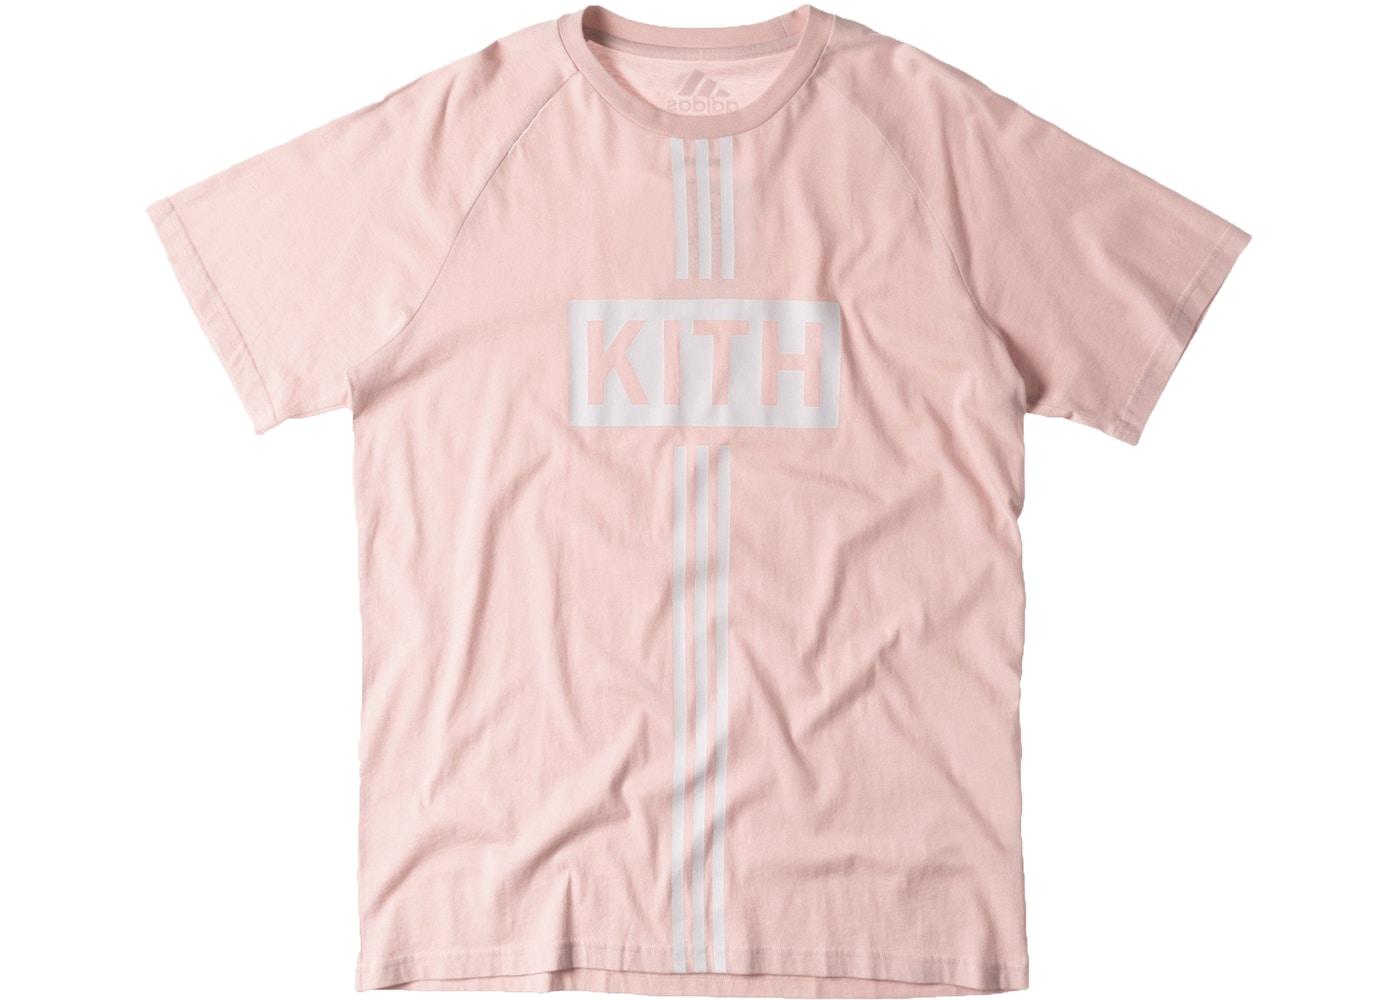 bd9a29cca4e117 Kith adidas Soccer Flamingos Home Classic Logo Tee Pink - SS17